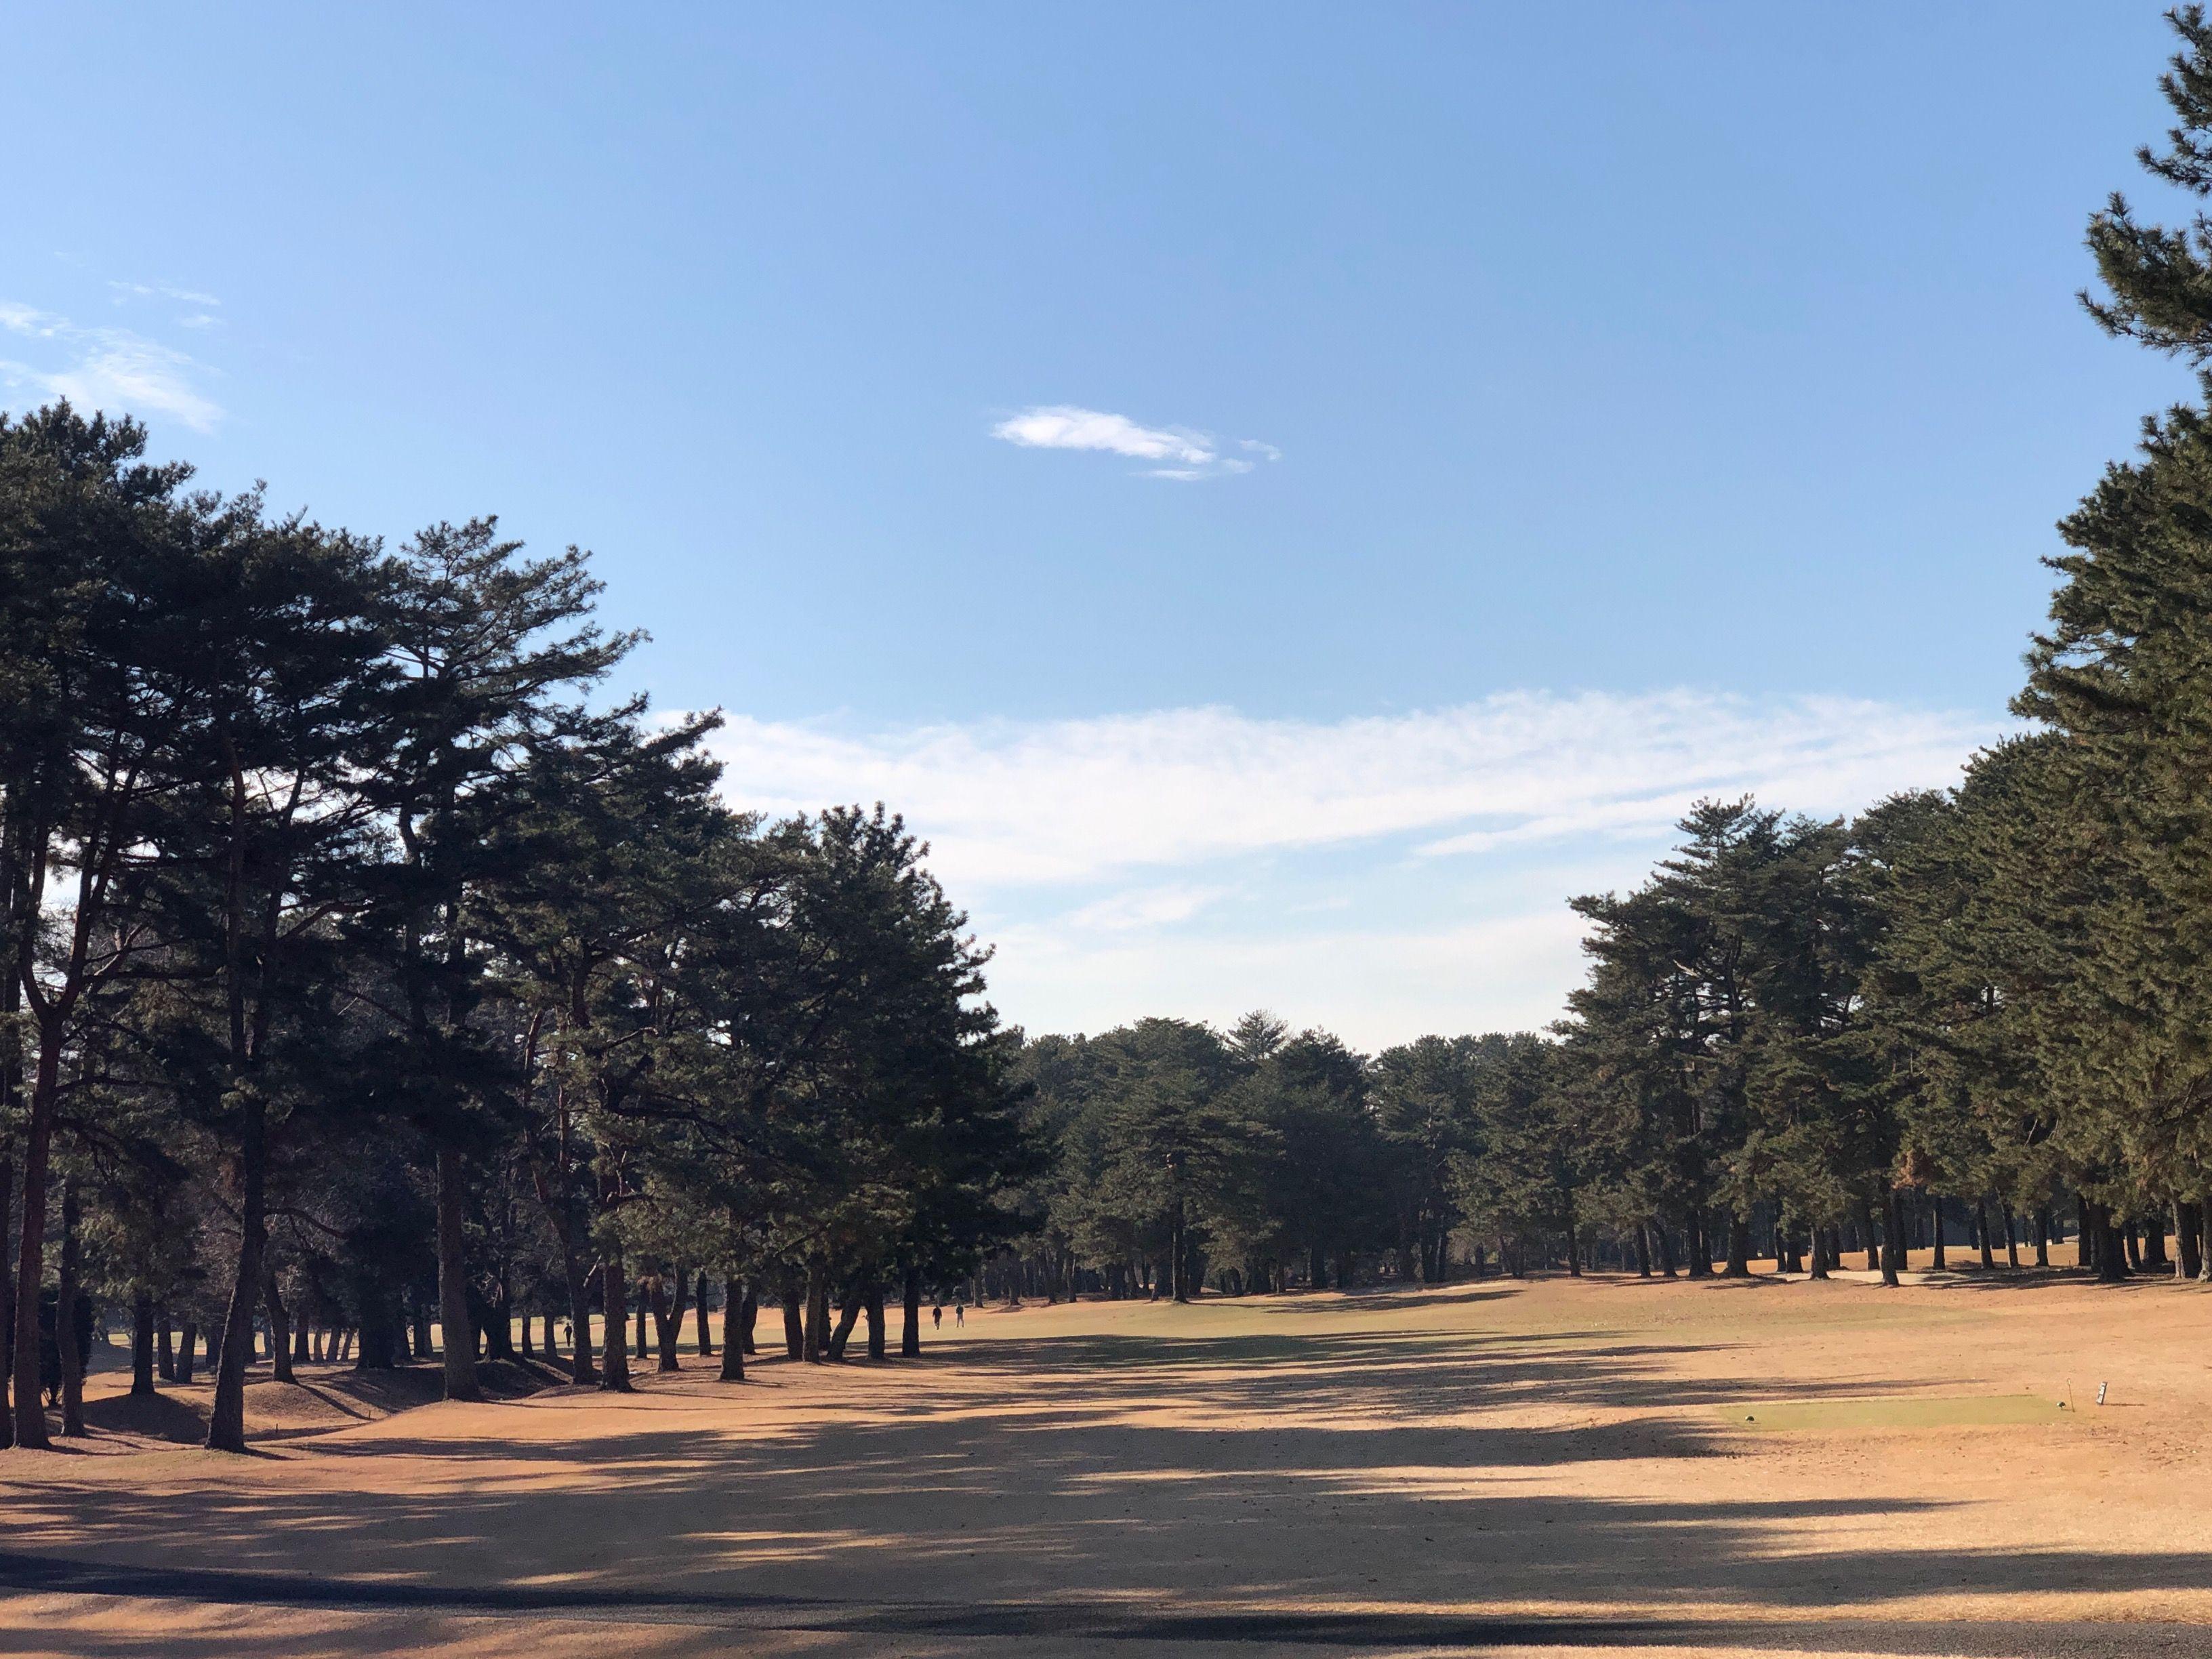 8d5ea0576a9d5 よく読まれている記事一覧 | レディスゴルファーのゴルフ奮闘記 - 楽天ブログ